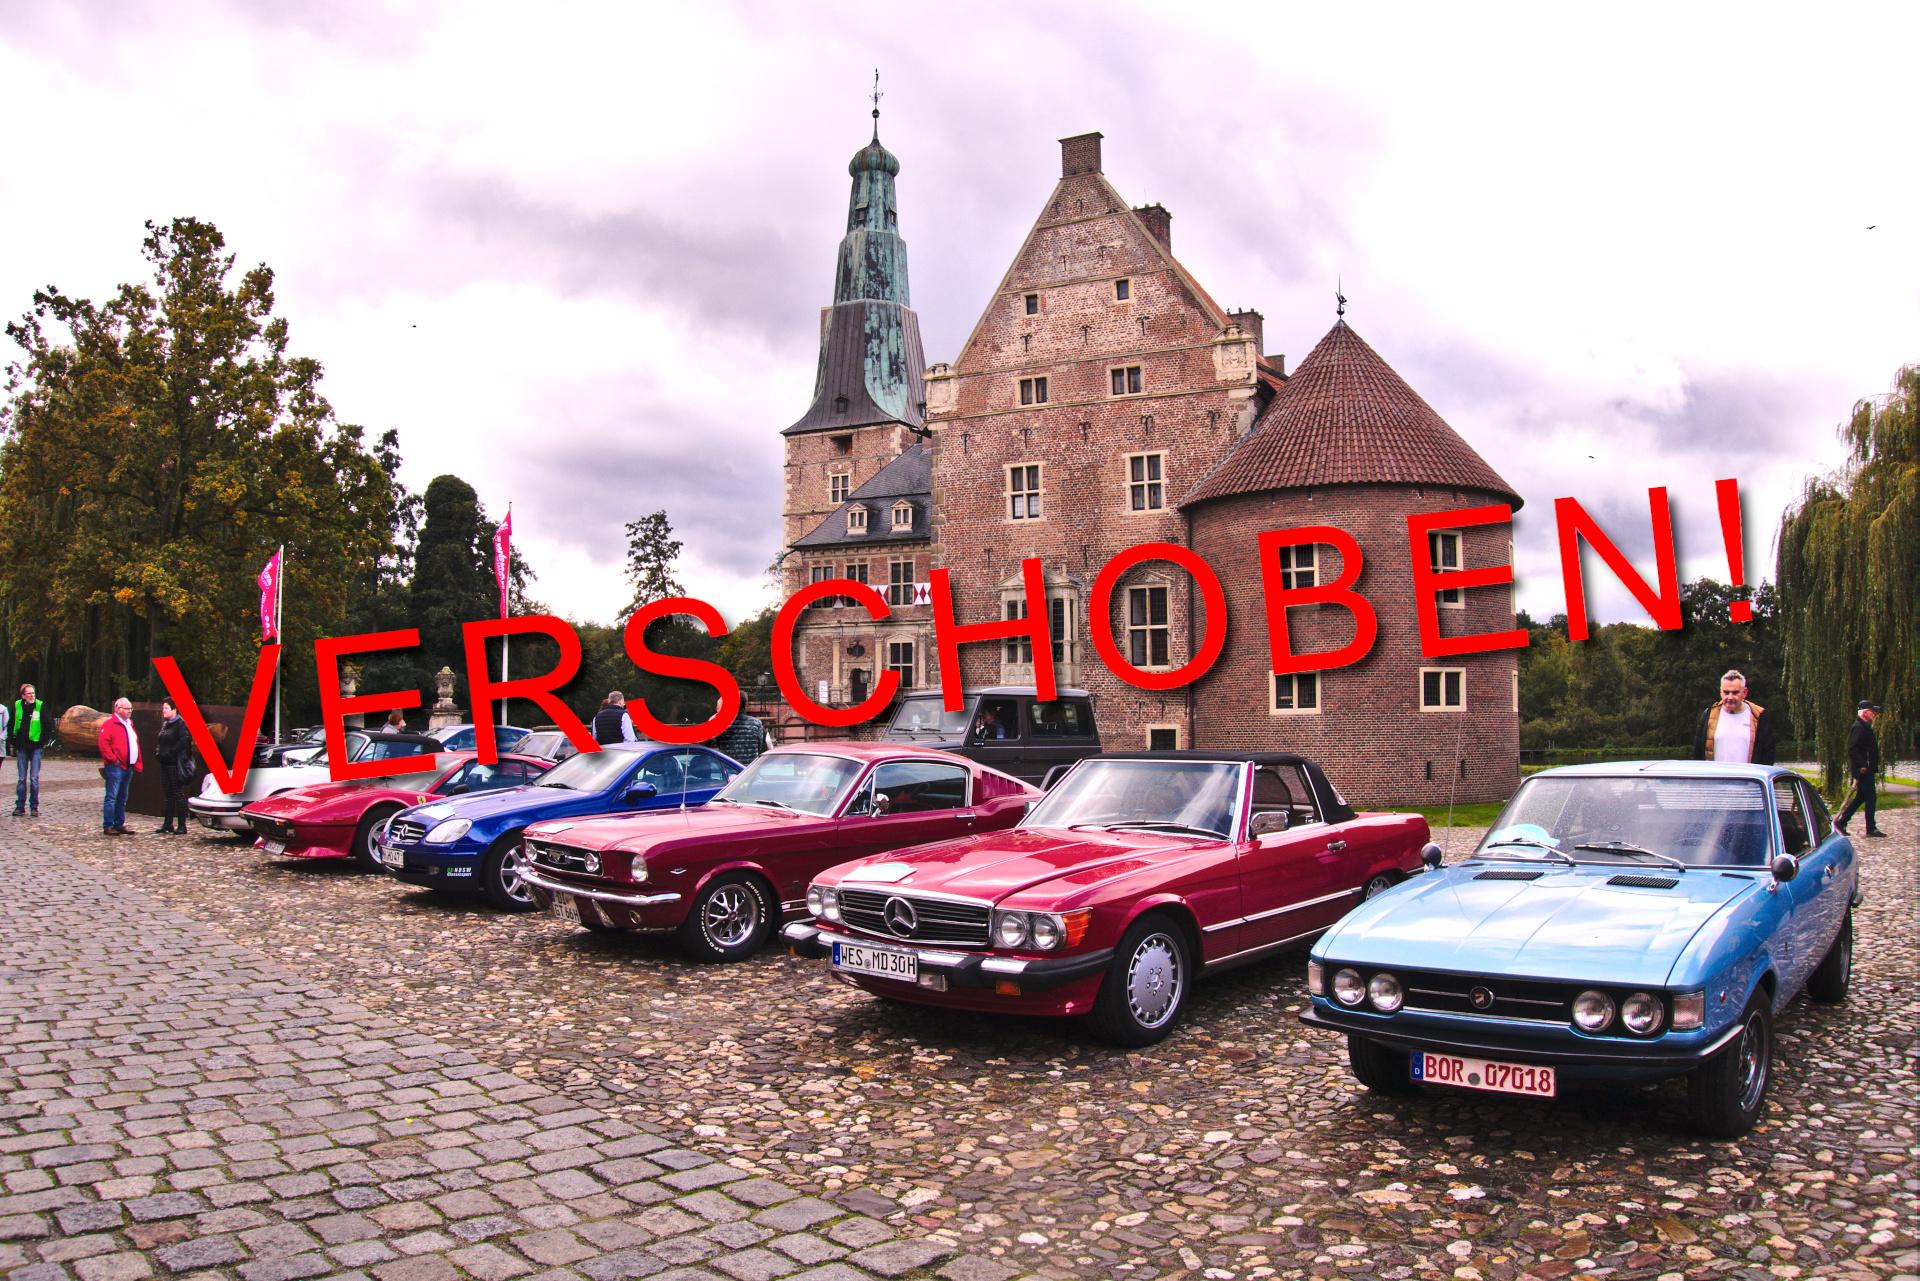 Verschoben: 5th Bocholt Classic verlegt auf den 22.08.21